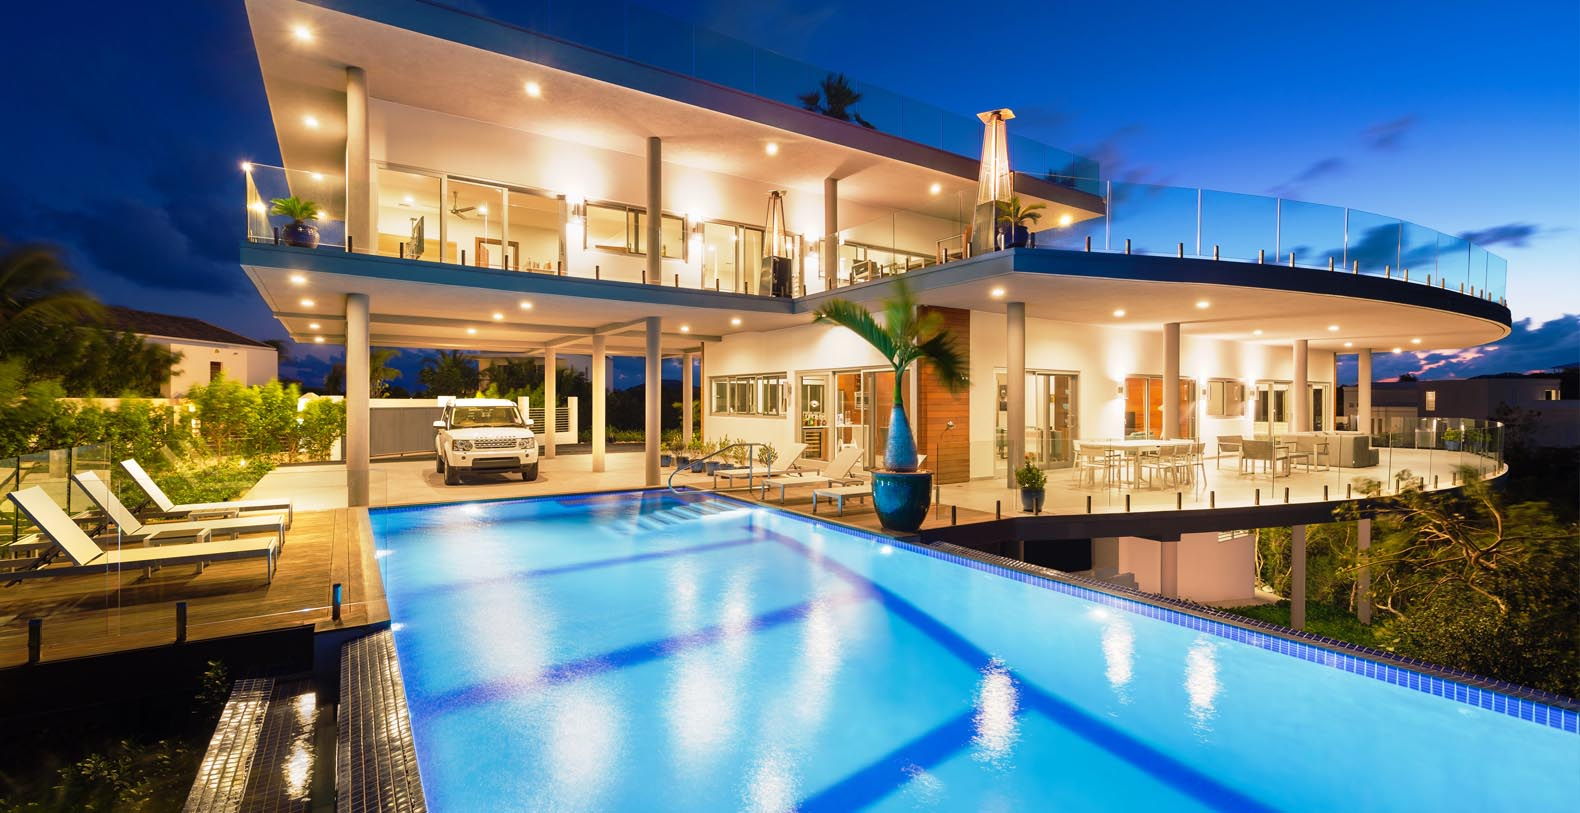 Villa Skyline Turks and Caicos, Vacation Rental